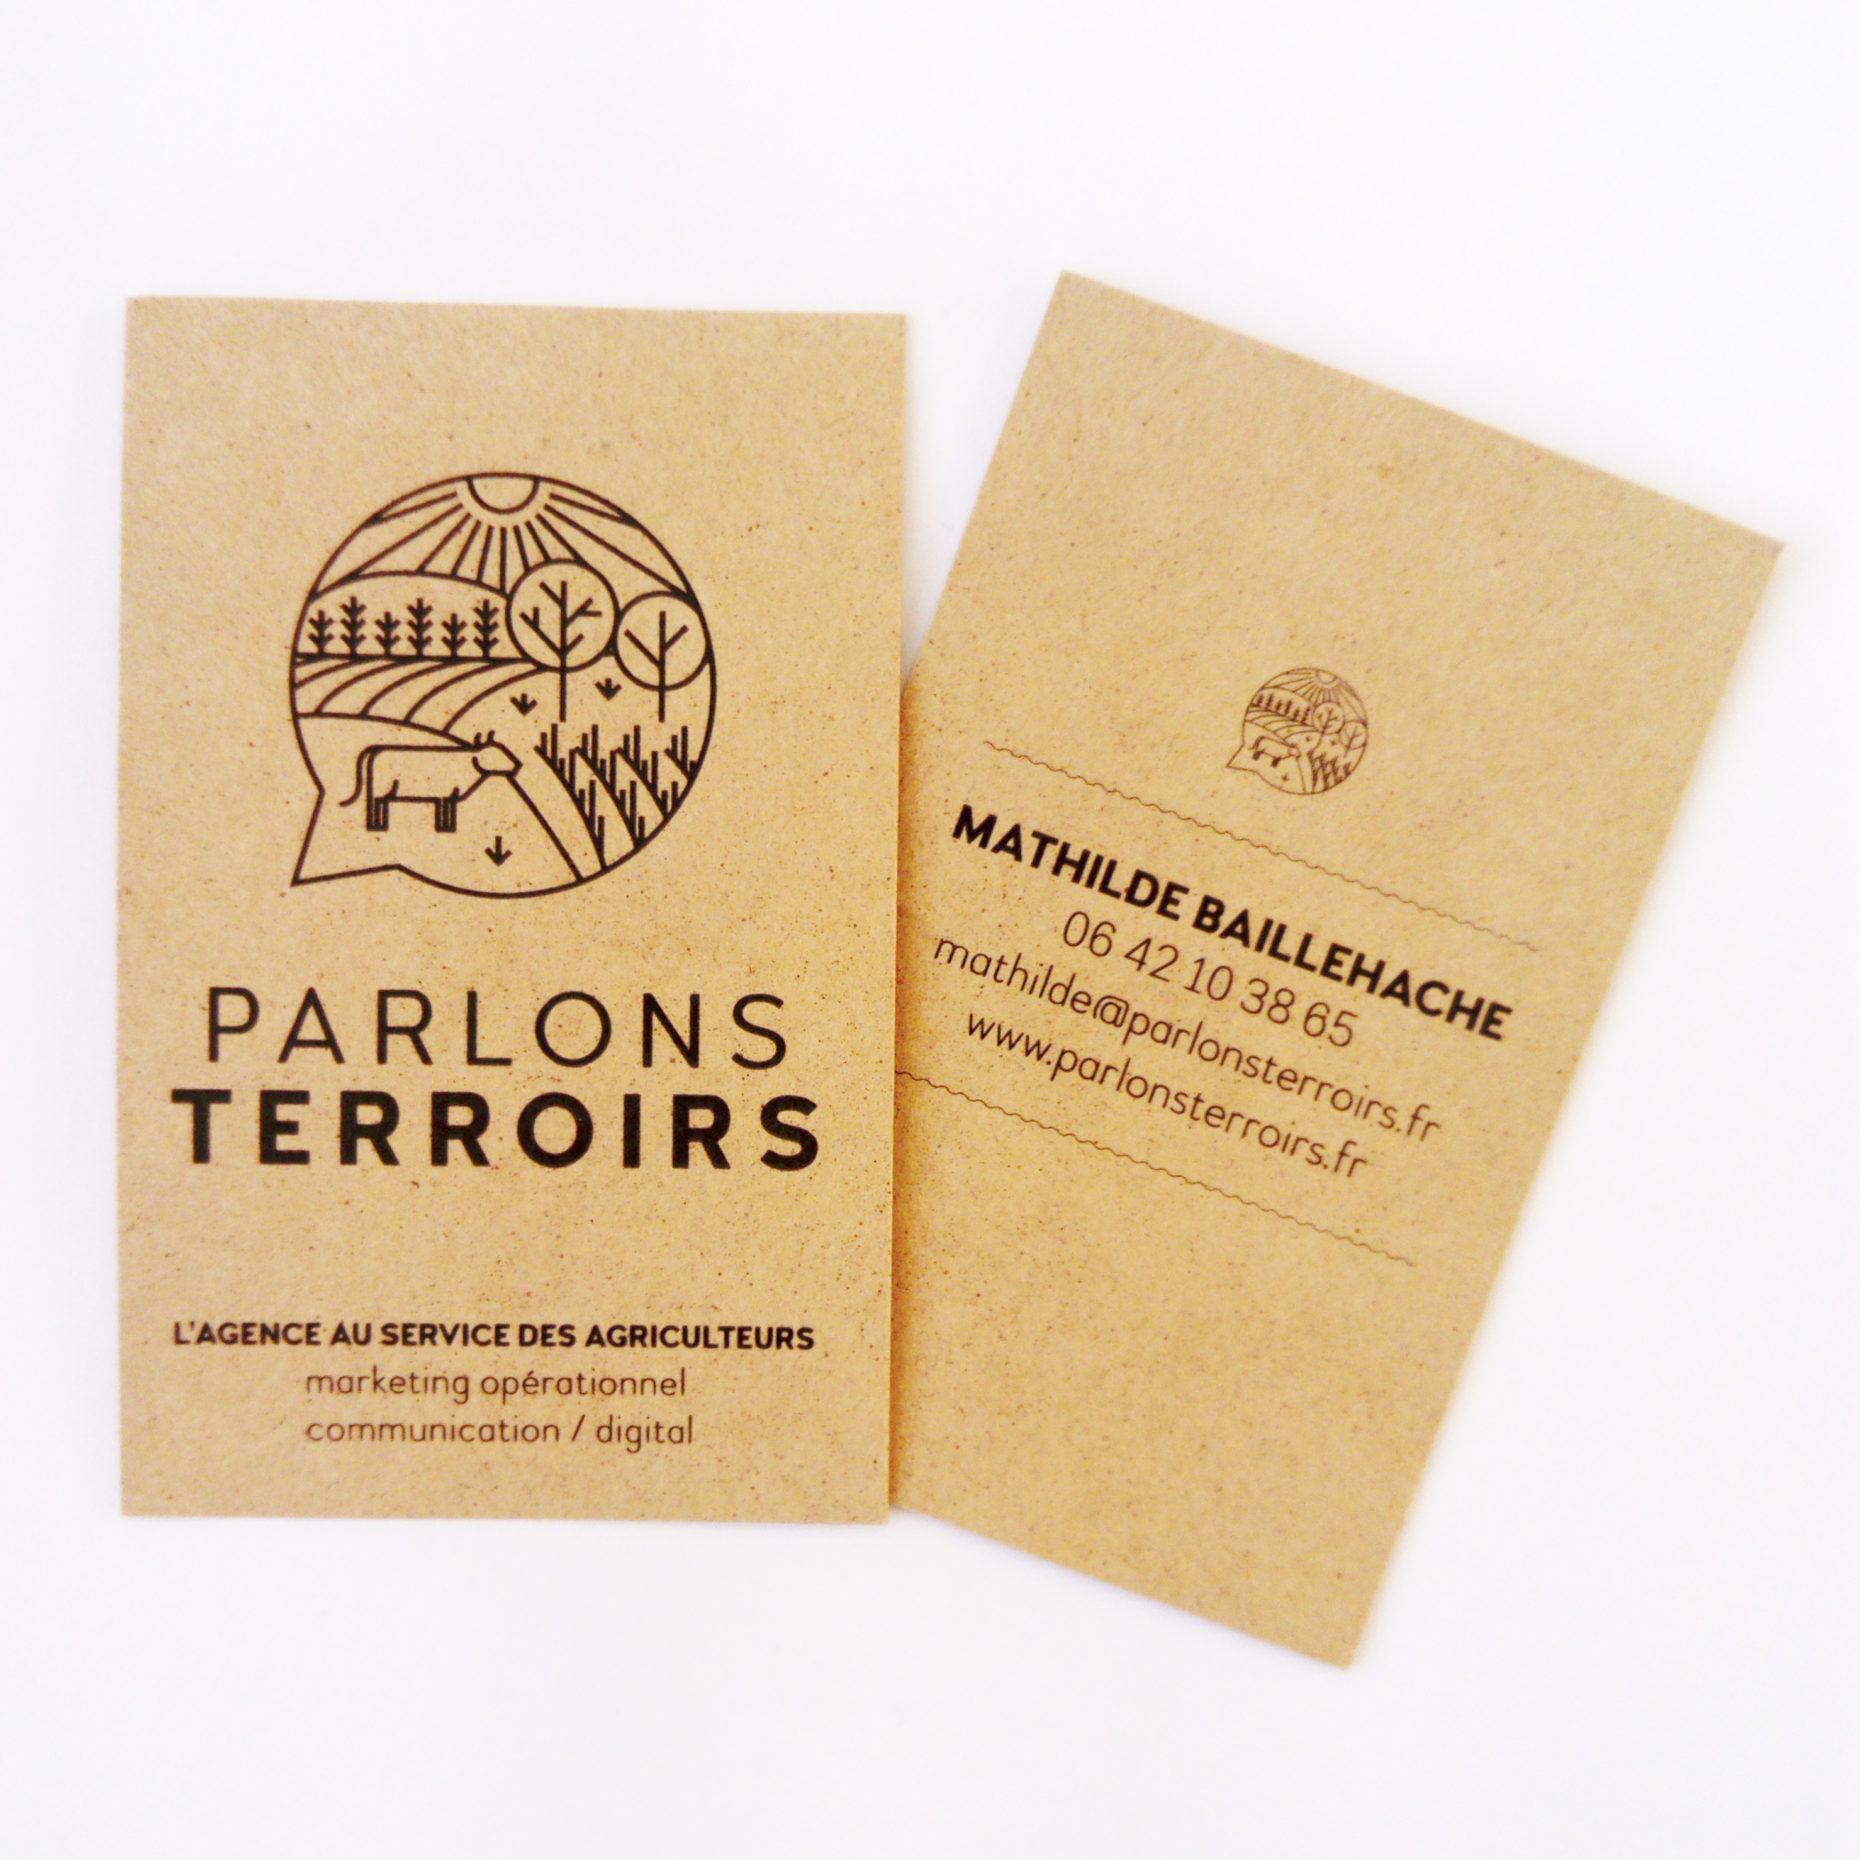 parlonsterroirs-logo-carte-arnaudneubert